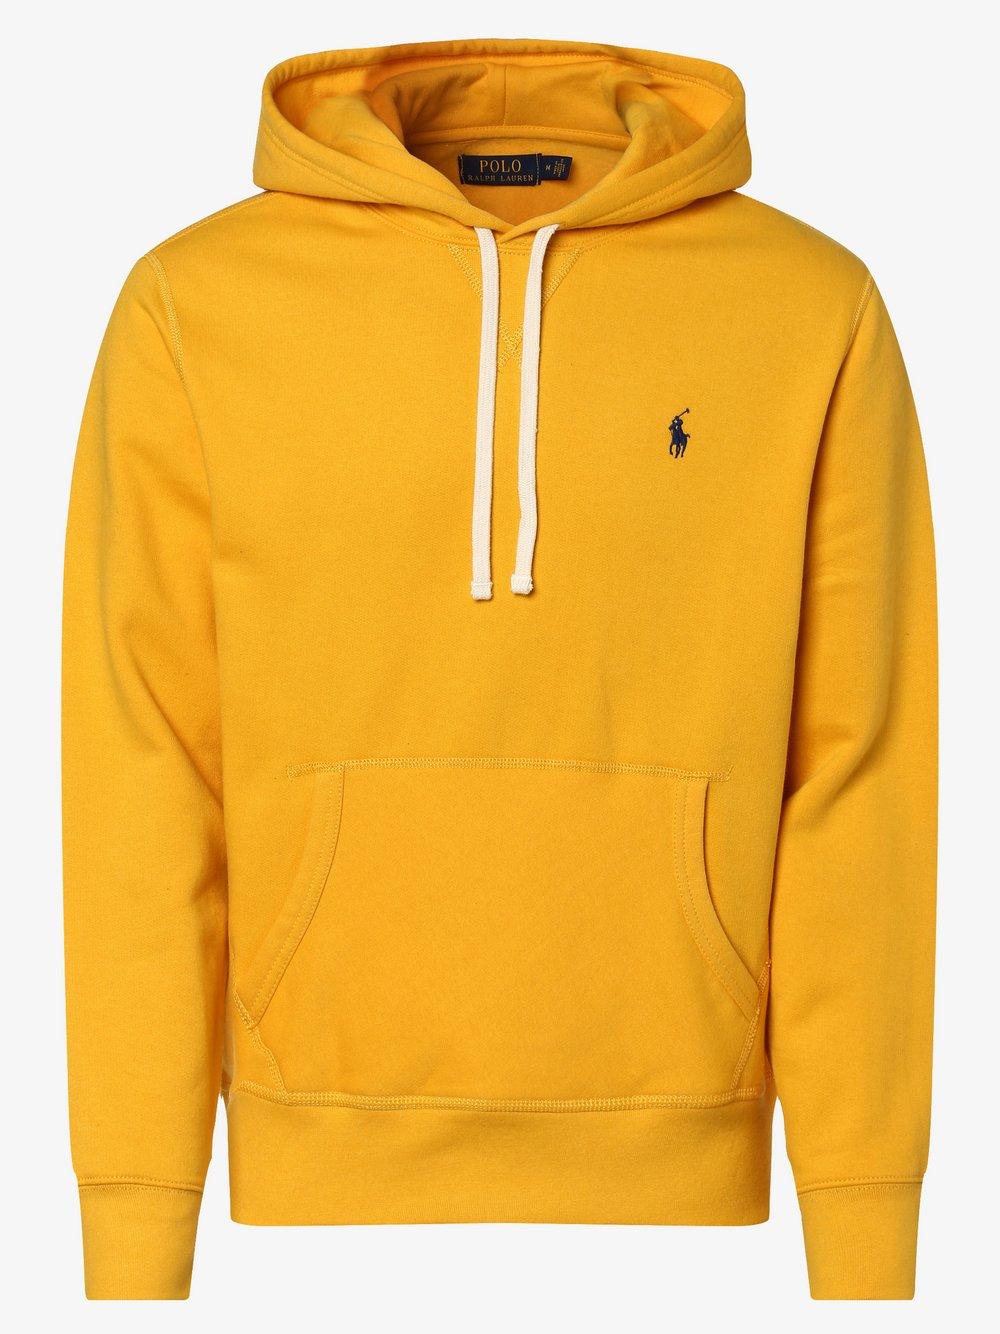 Polo Ralph Lauren - Męska bluza nierozpinana, żółty